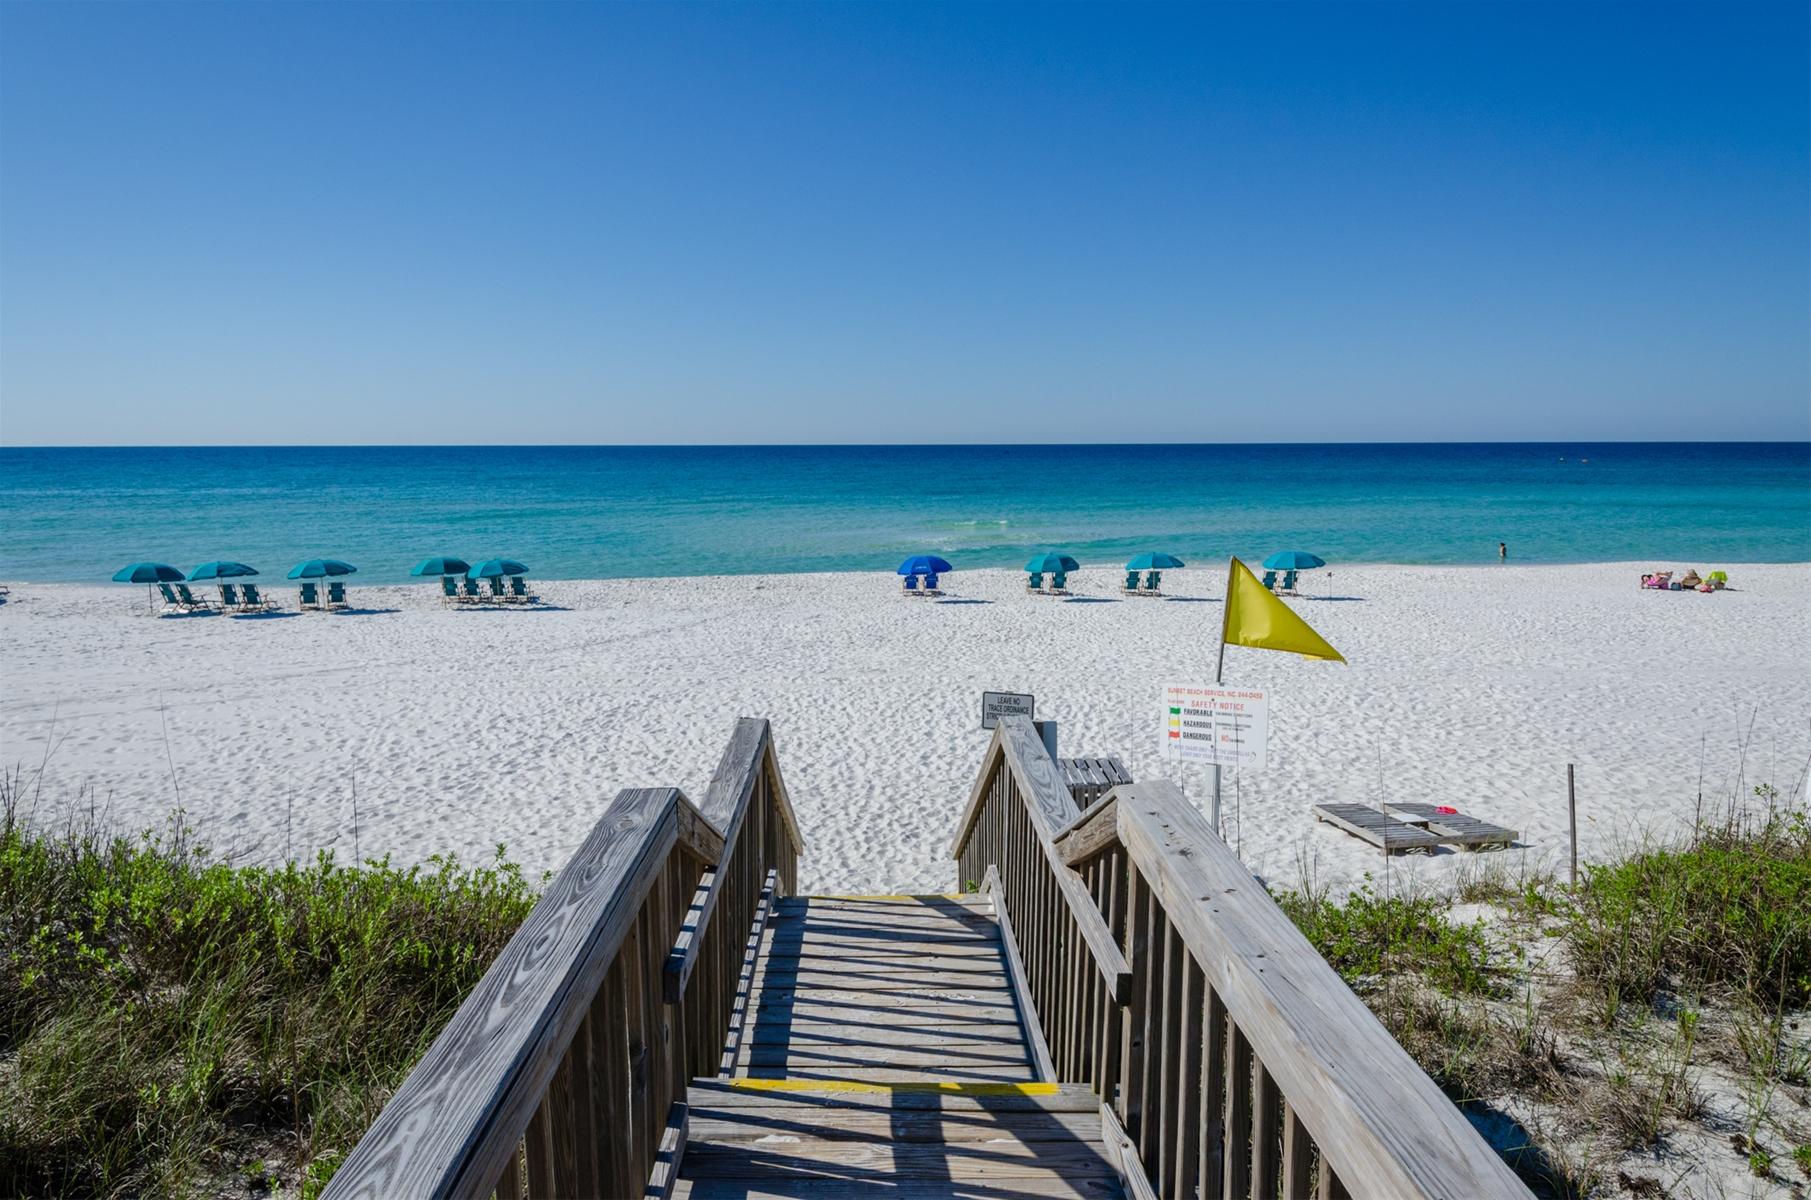 Vacation Rentals at Caribbean Resort Navarre Beach FL